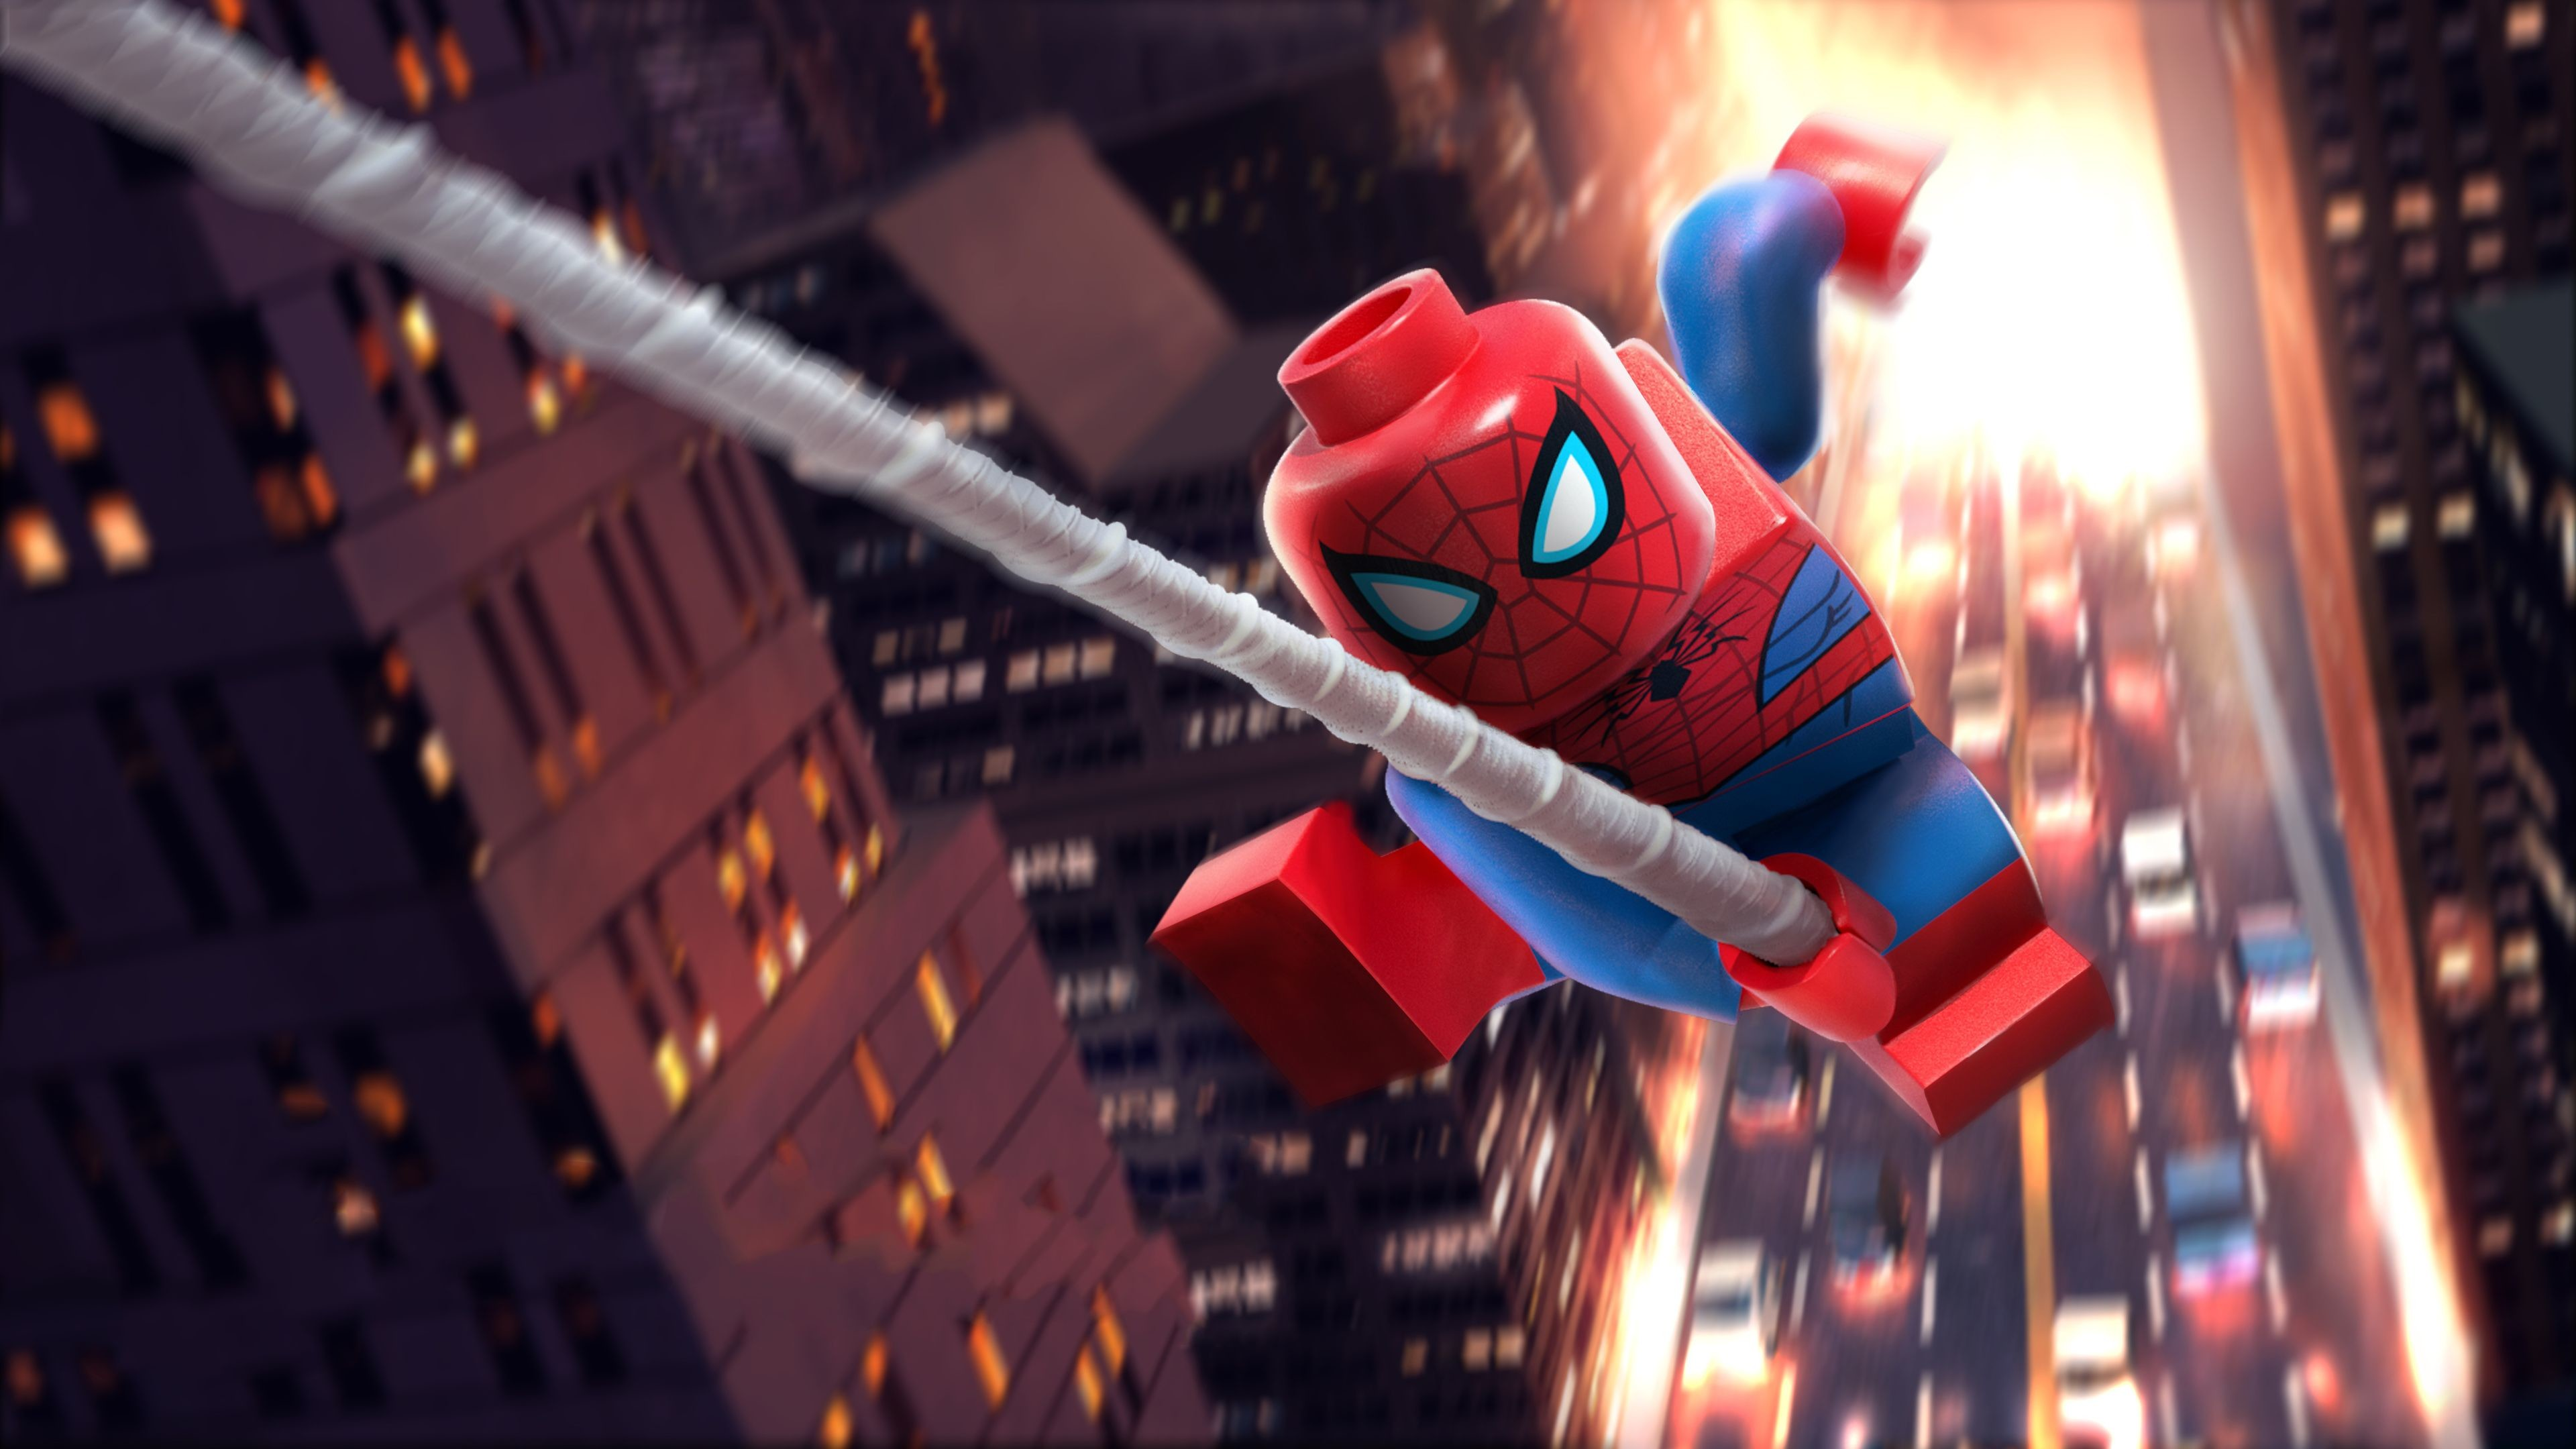 Res: 3840x2160, Lego Spiderman 5k superheroes wallpapers, spiderman wallpapers, lego  wallpapers, hd-wallpapers, 5k wallpapers, 4k-wallpapers